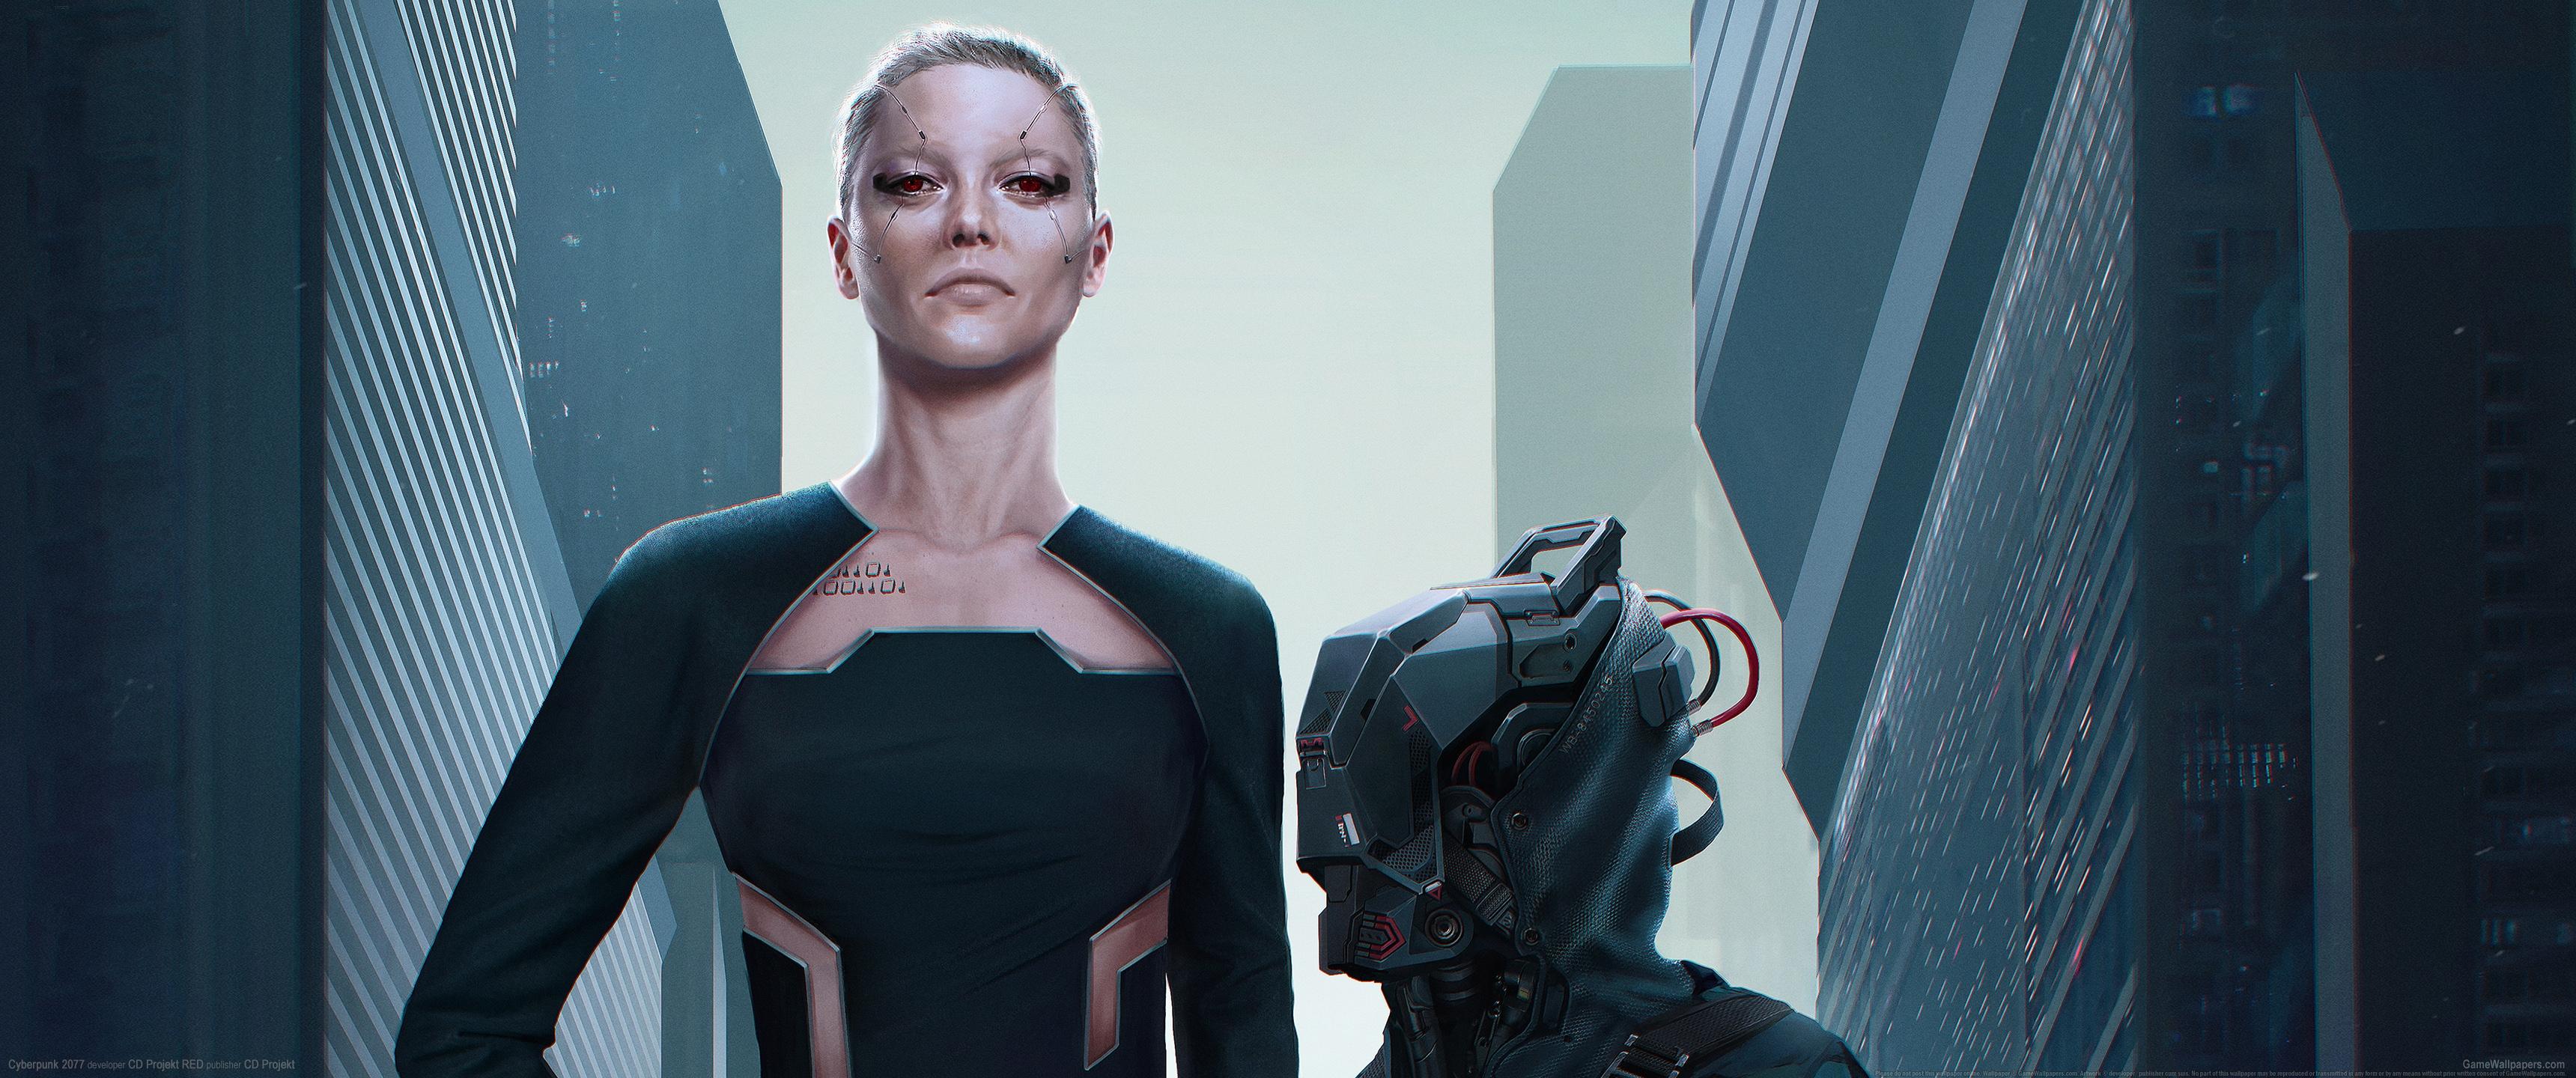 Cyberpunk 2077 3440x1440 fond d'écran 22